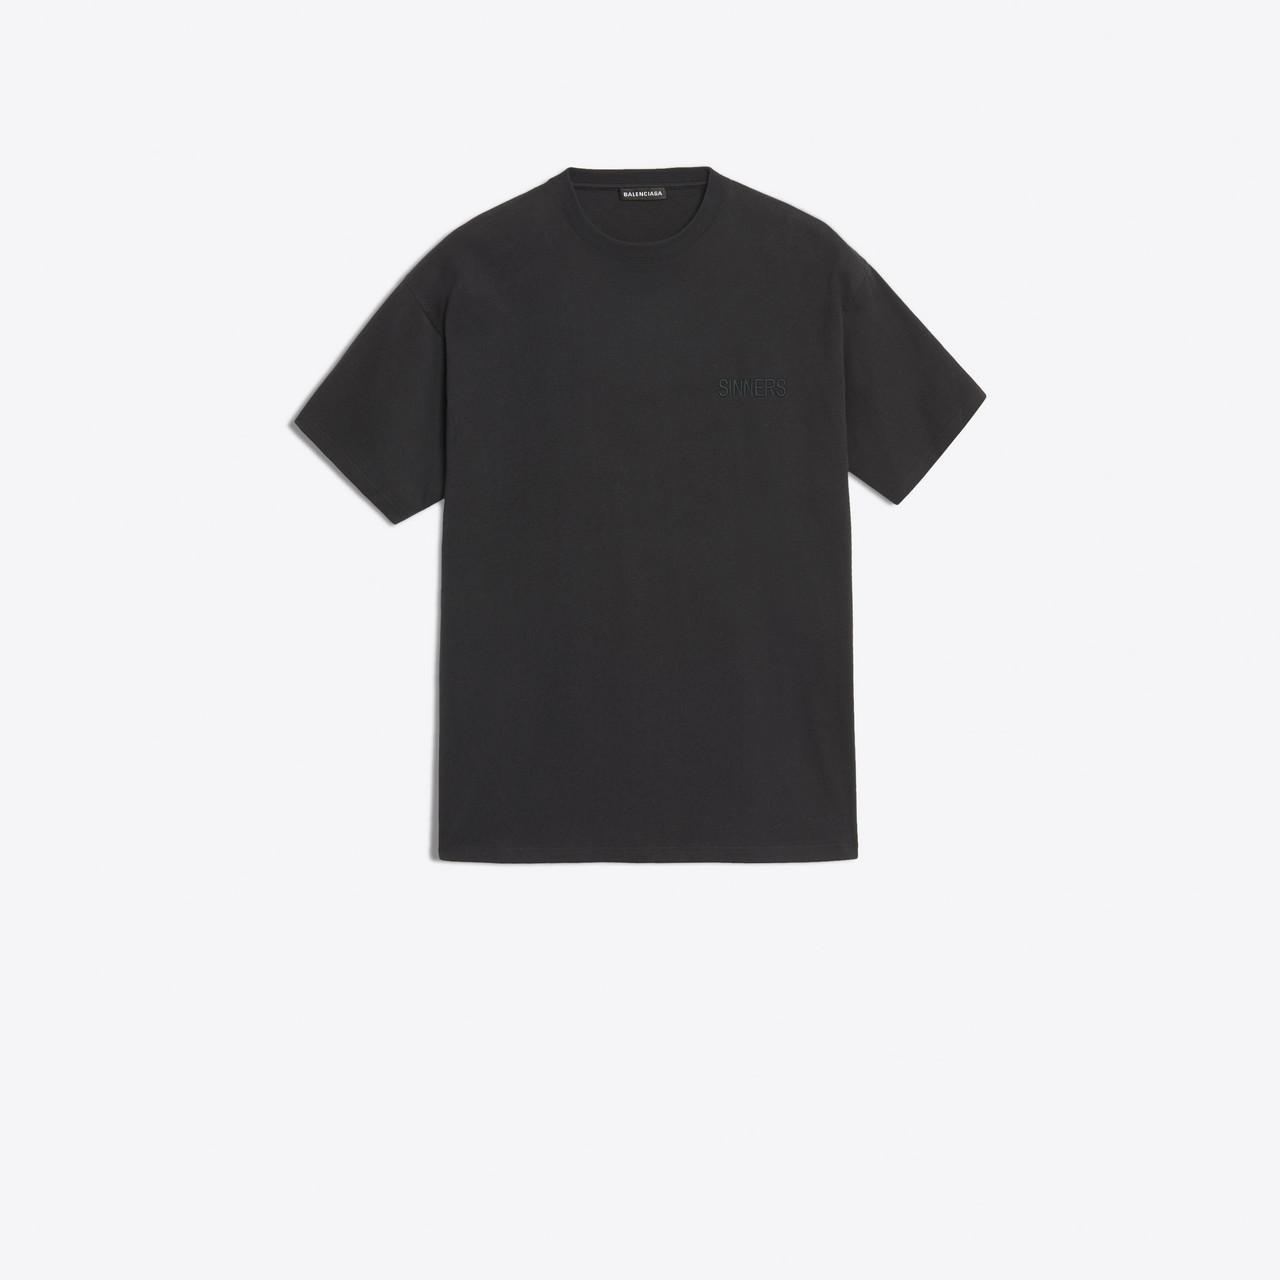 6b72f3165842 Balenciaga - Black T-shirt 'sinners' for Men - Lyst. View fullscreen